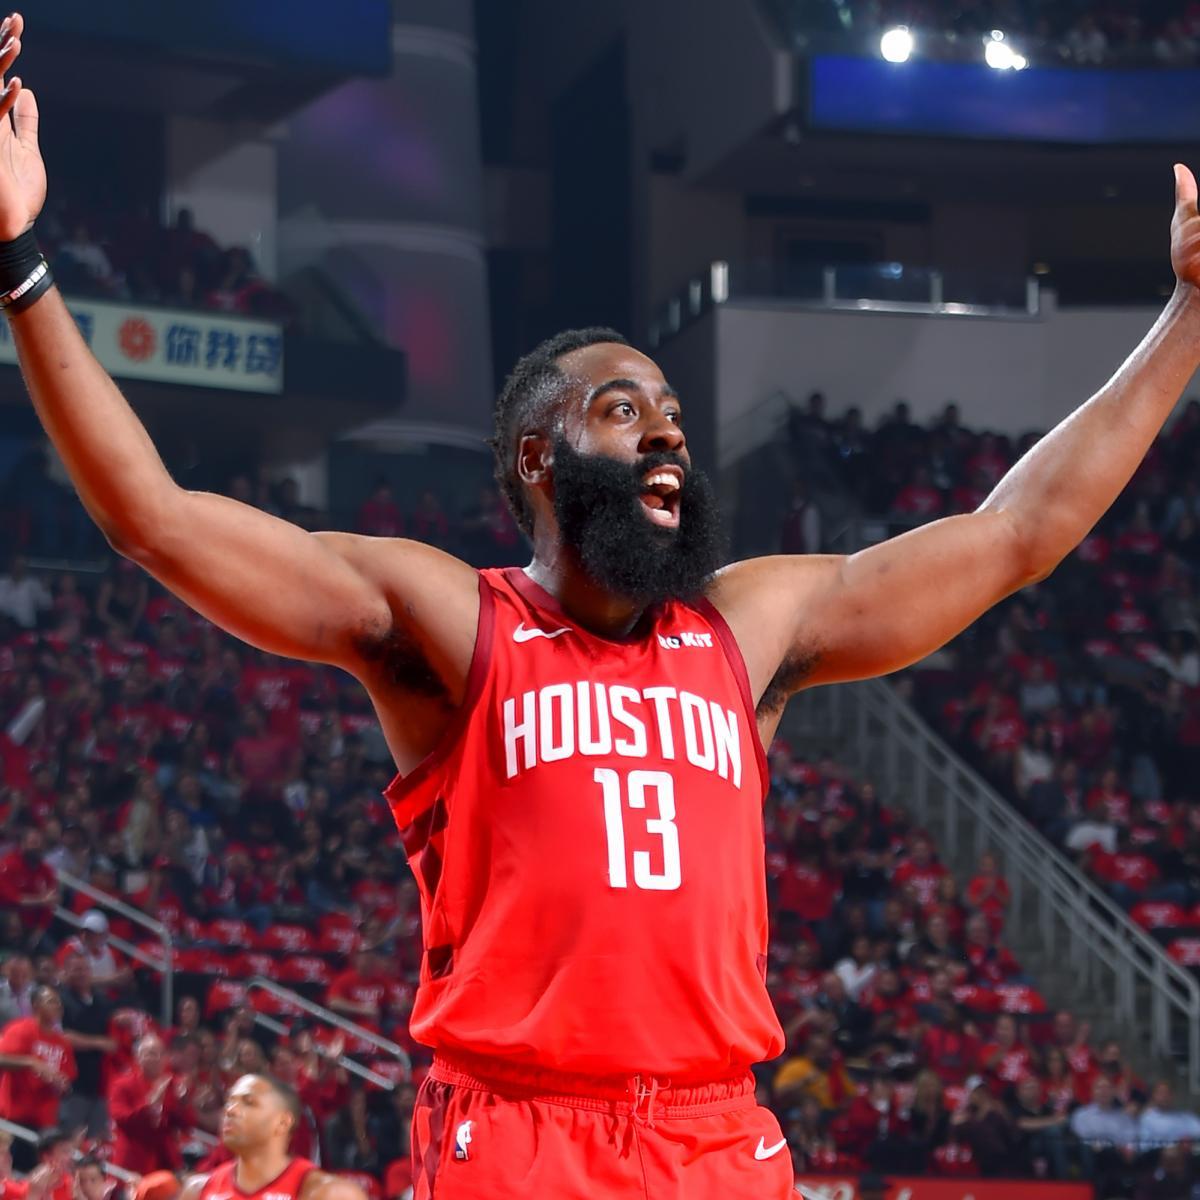 Rockets Jazz Game 2: James Harden Continues Torrid Streak As Rockets Rout Jazz